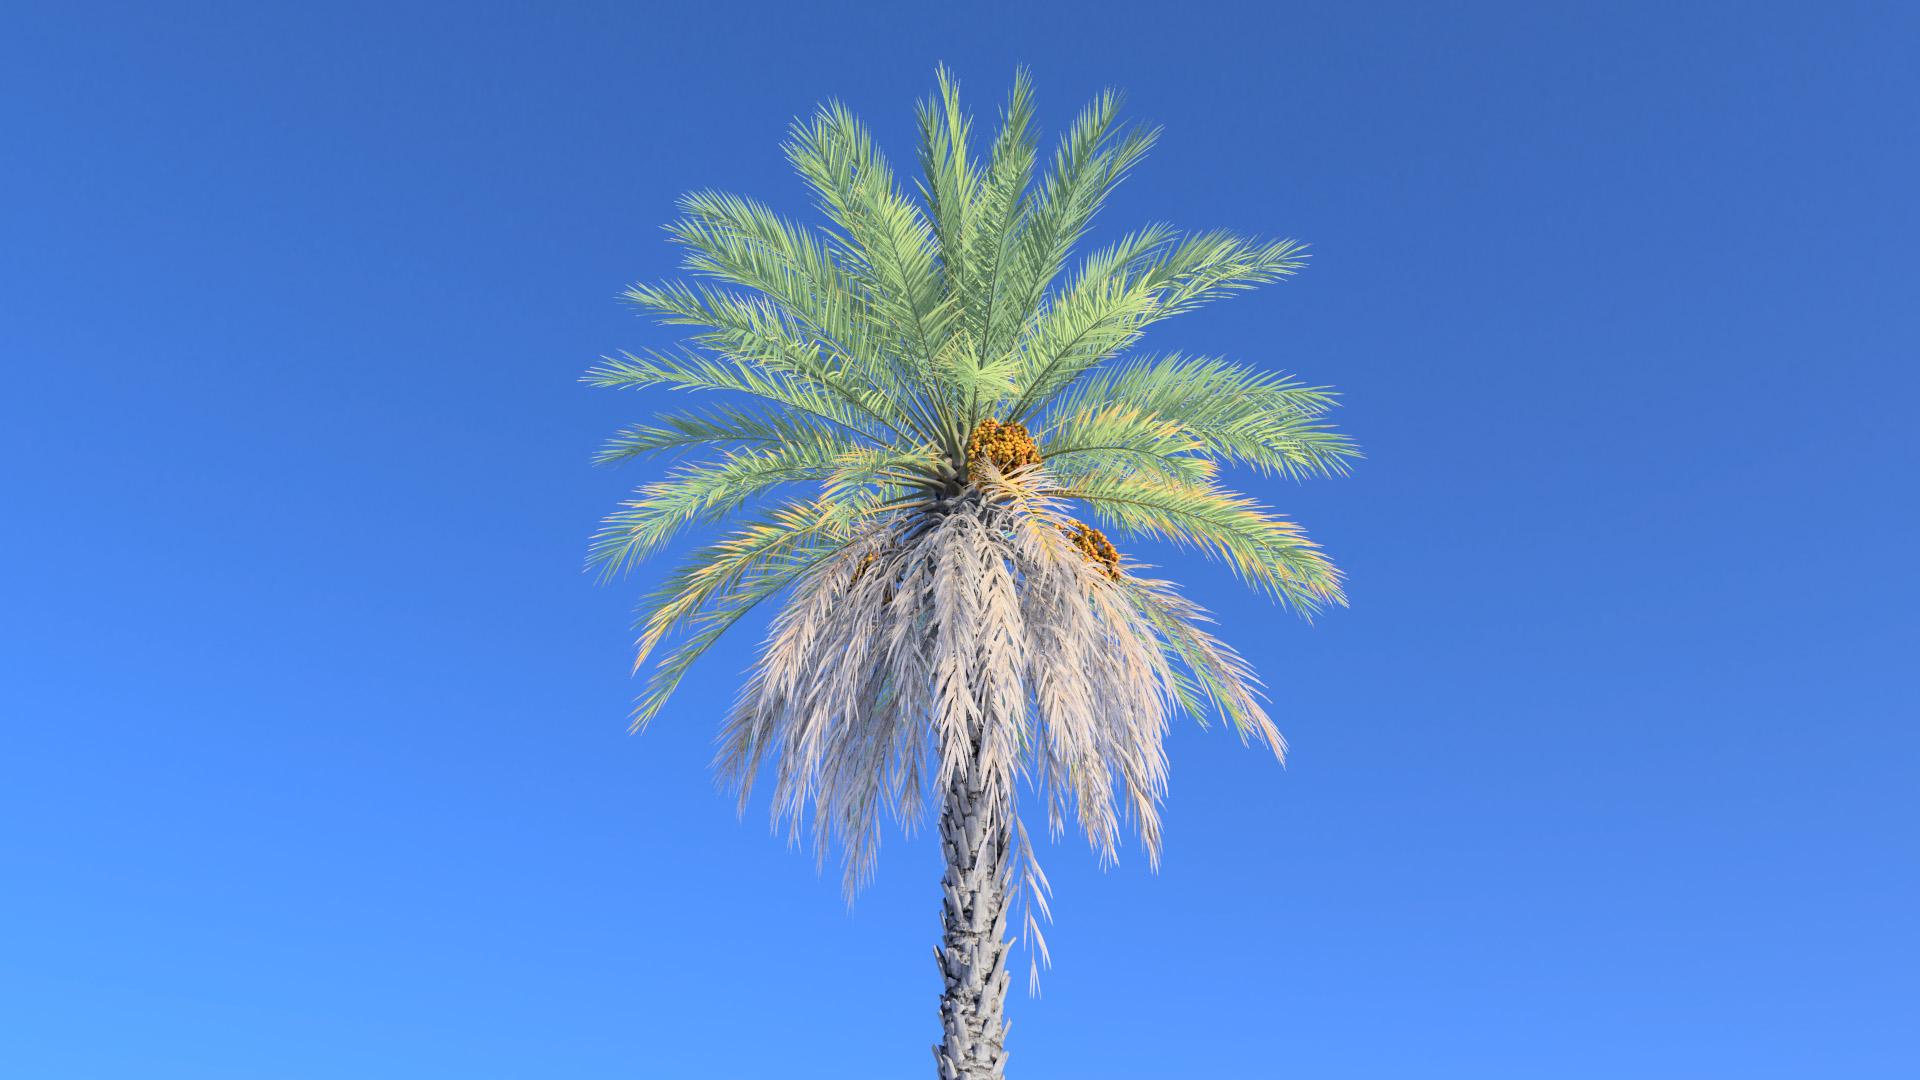 3D model of the Date palm Phoenix dactylifera close-up